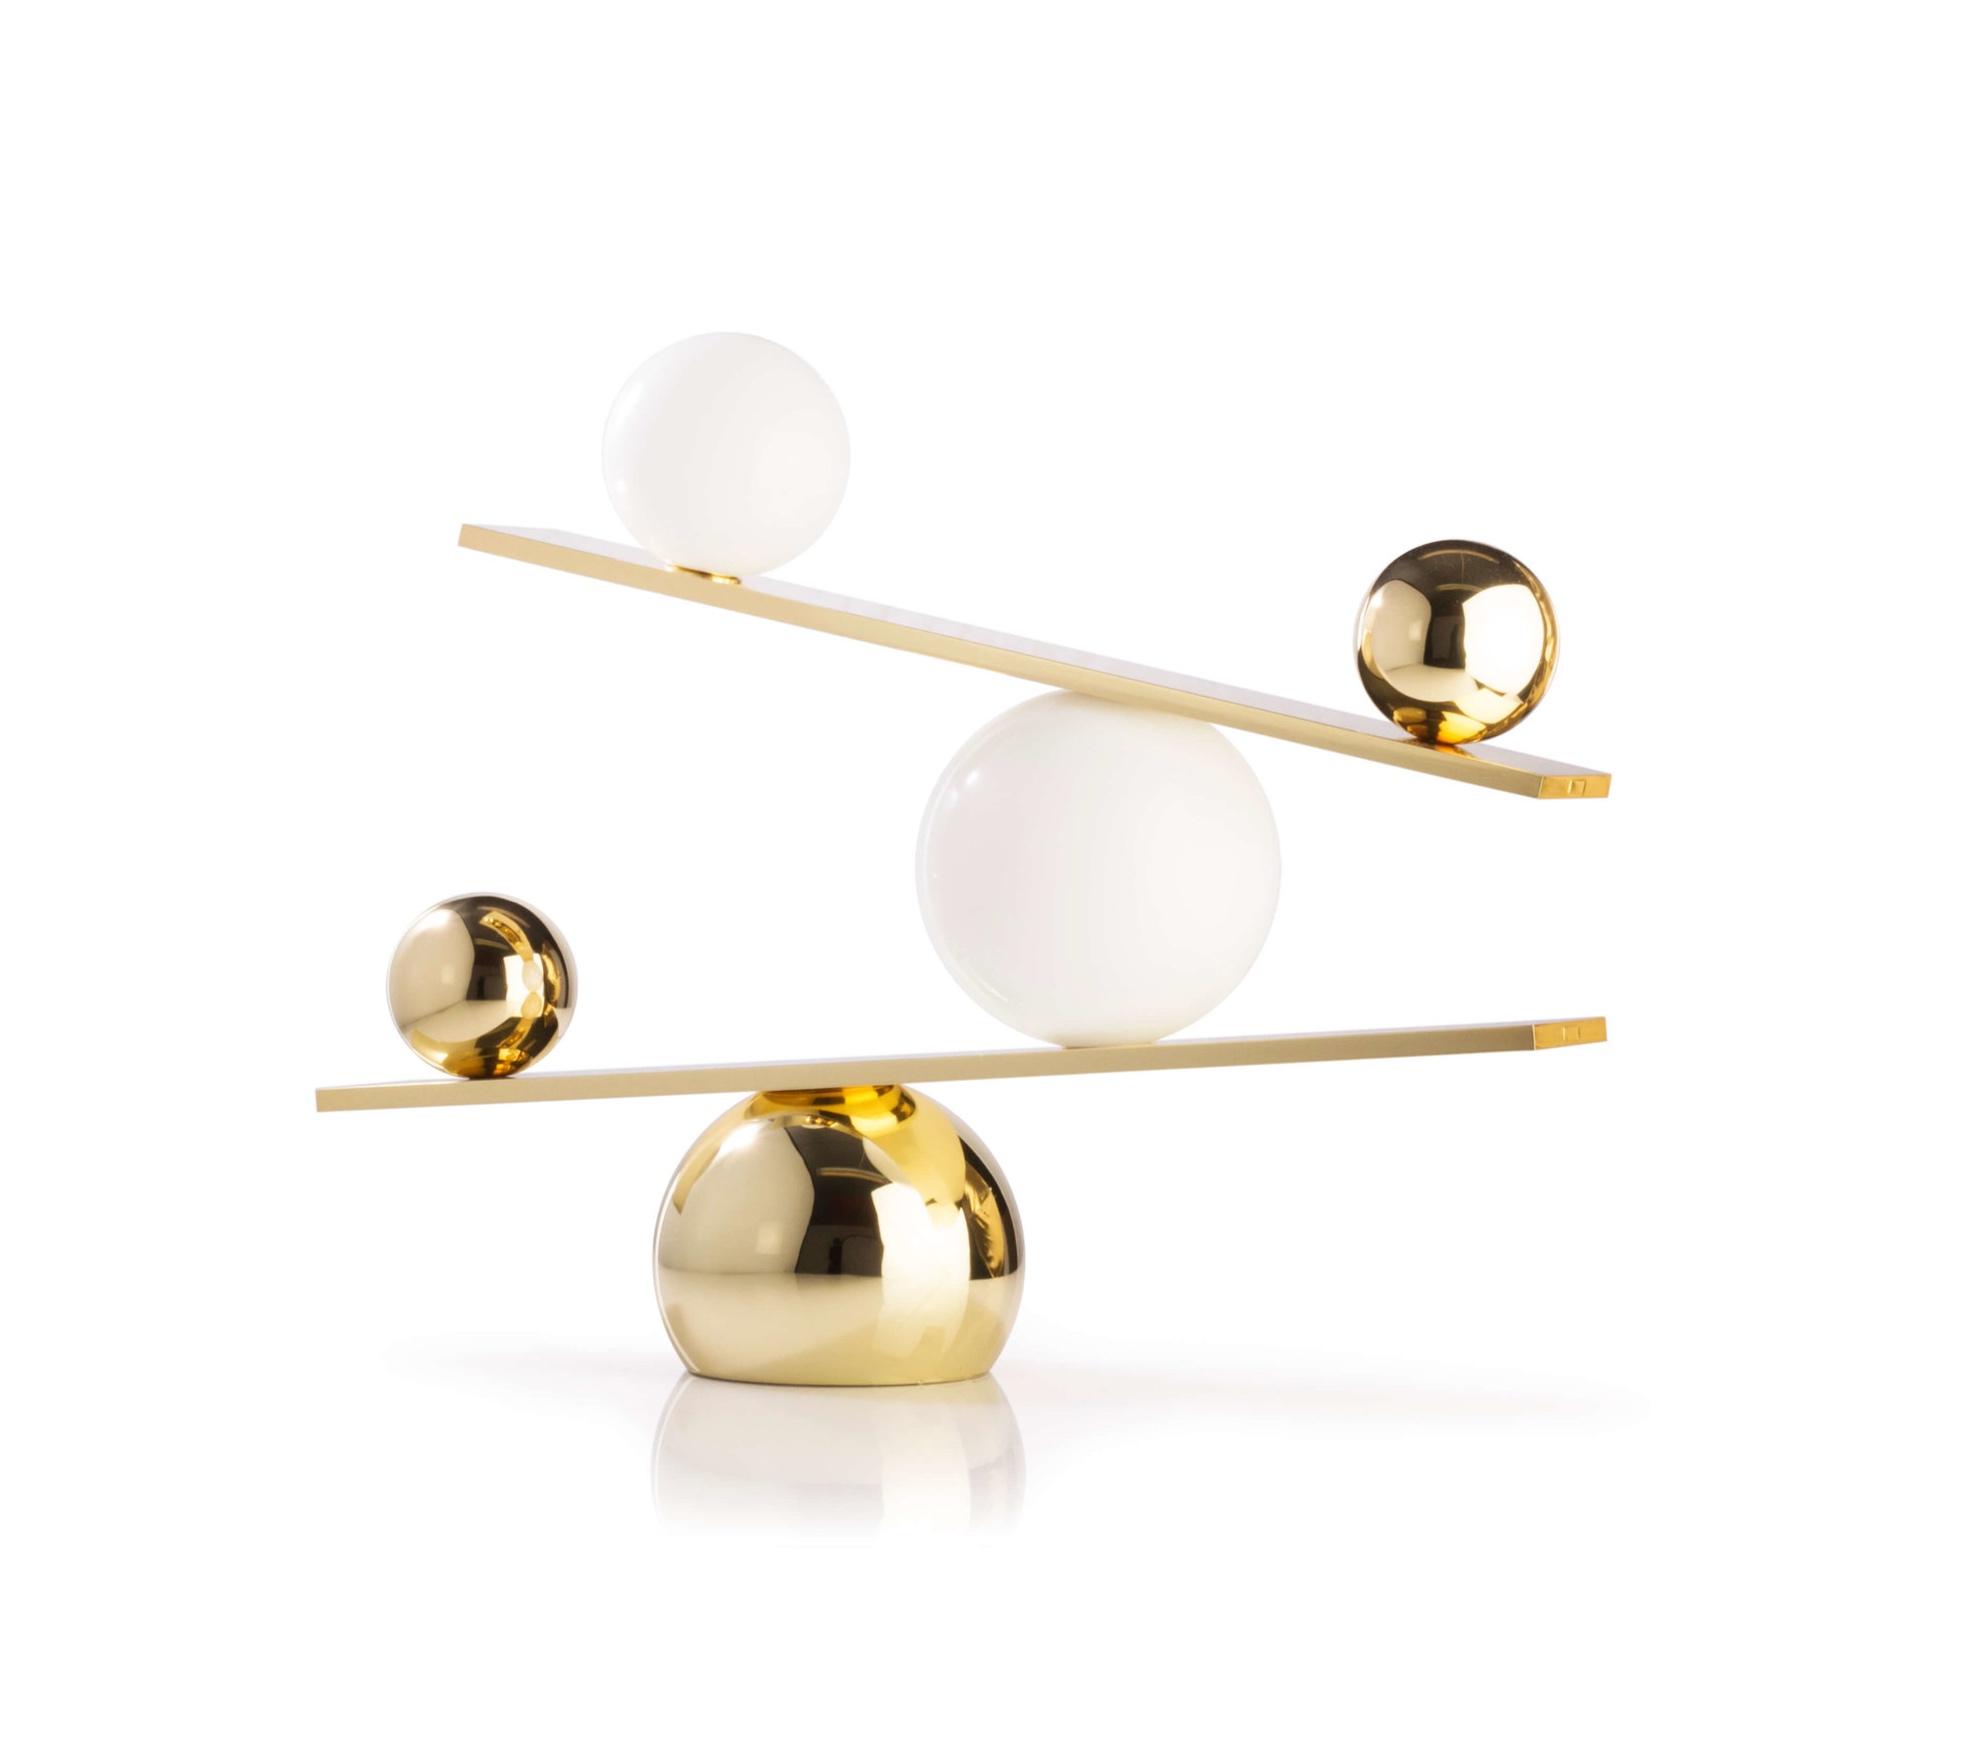 Oblure 'Balance' Table Lamp